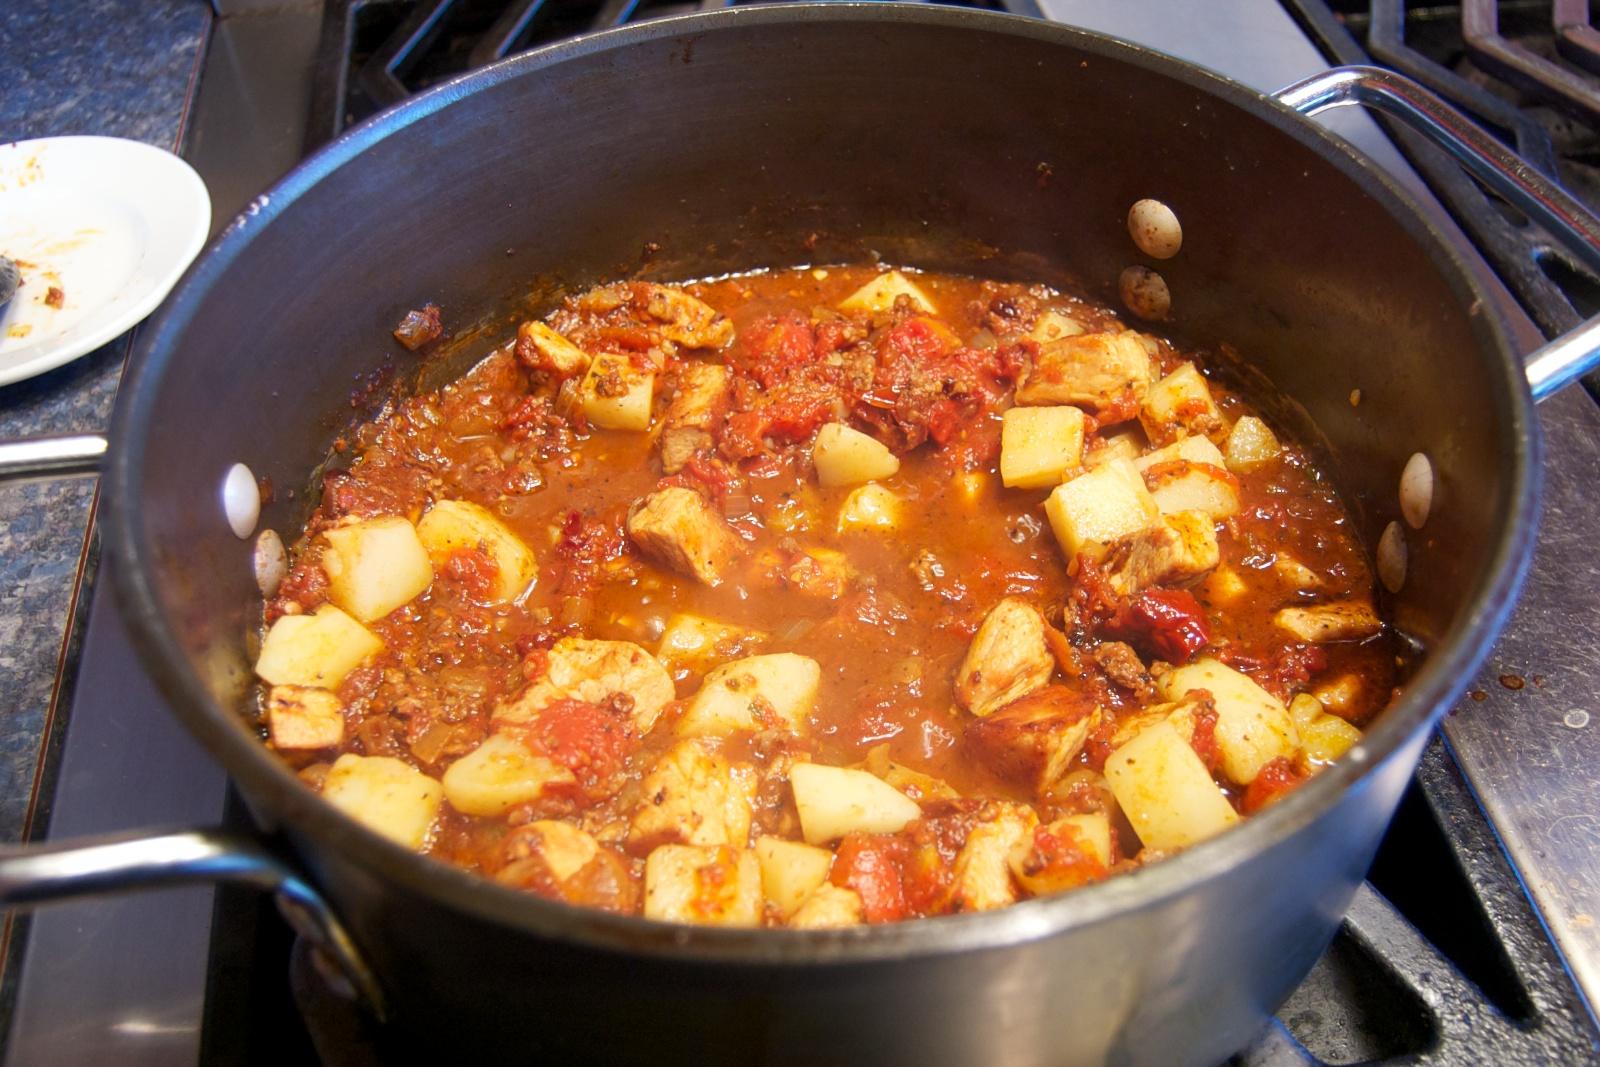 http://blog.rickk.com/food/2012/02/06/ate.2012.02.06.c9.jpg